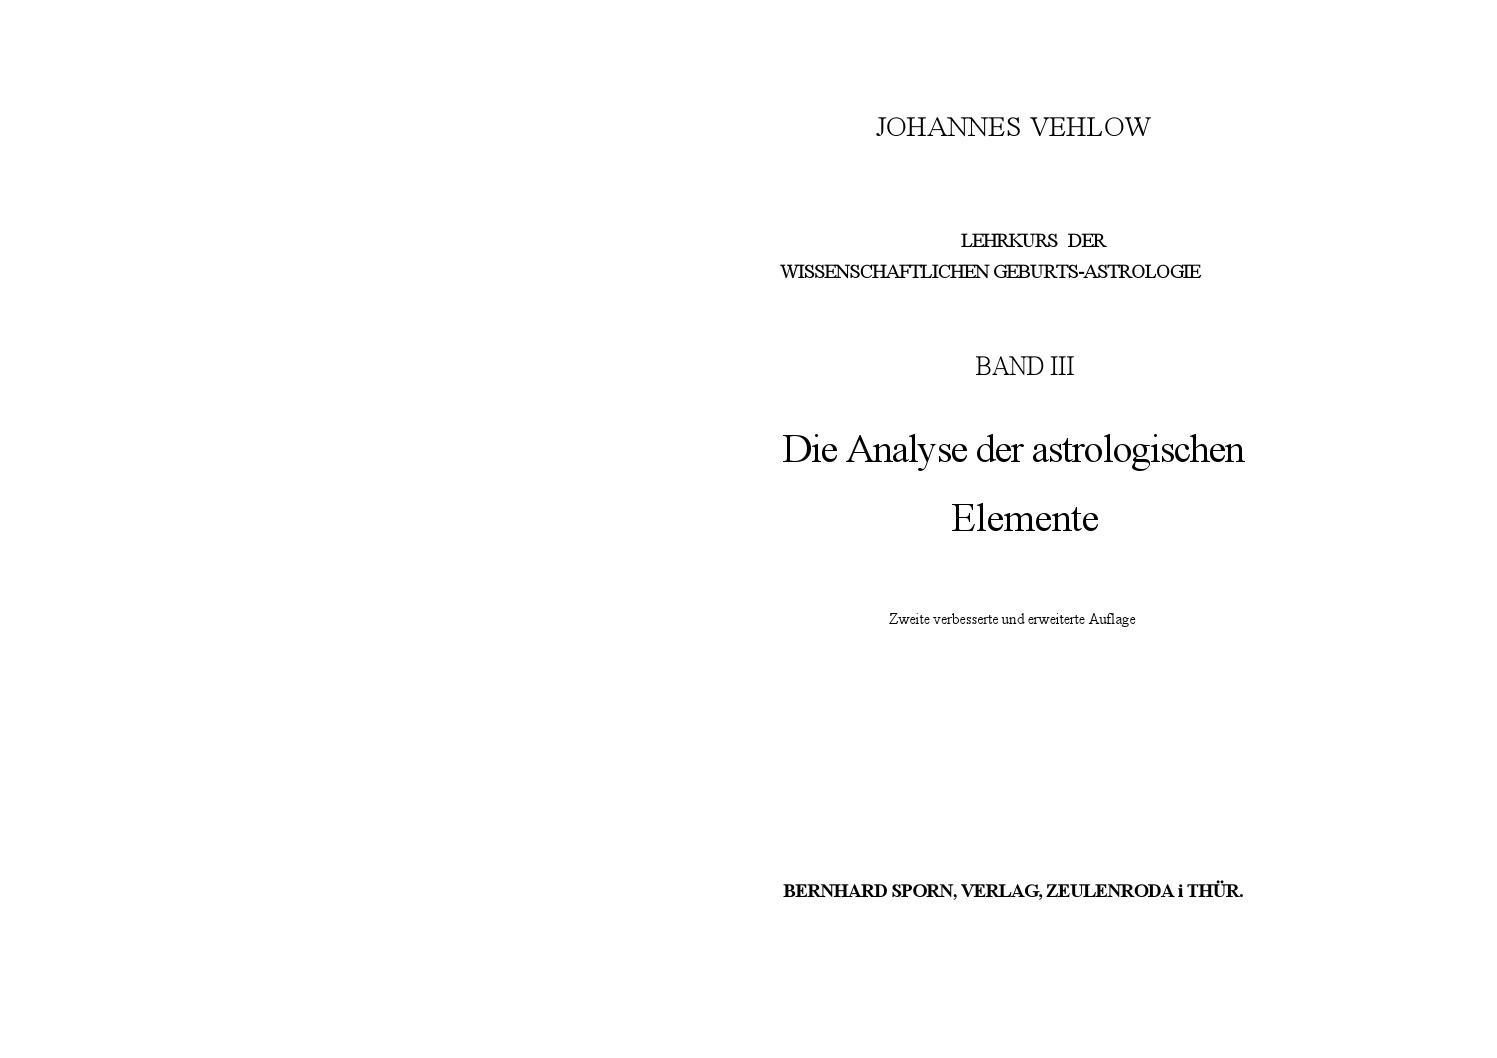 Johannes vehlow band iii by Umn Him - issuu